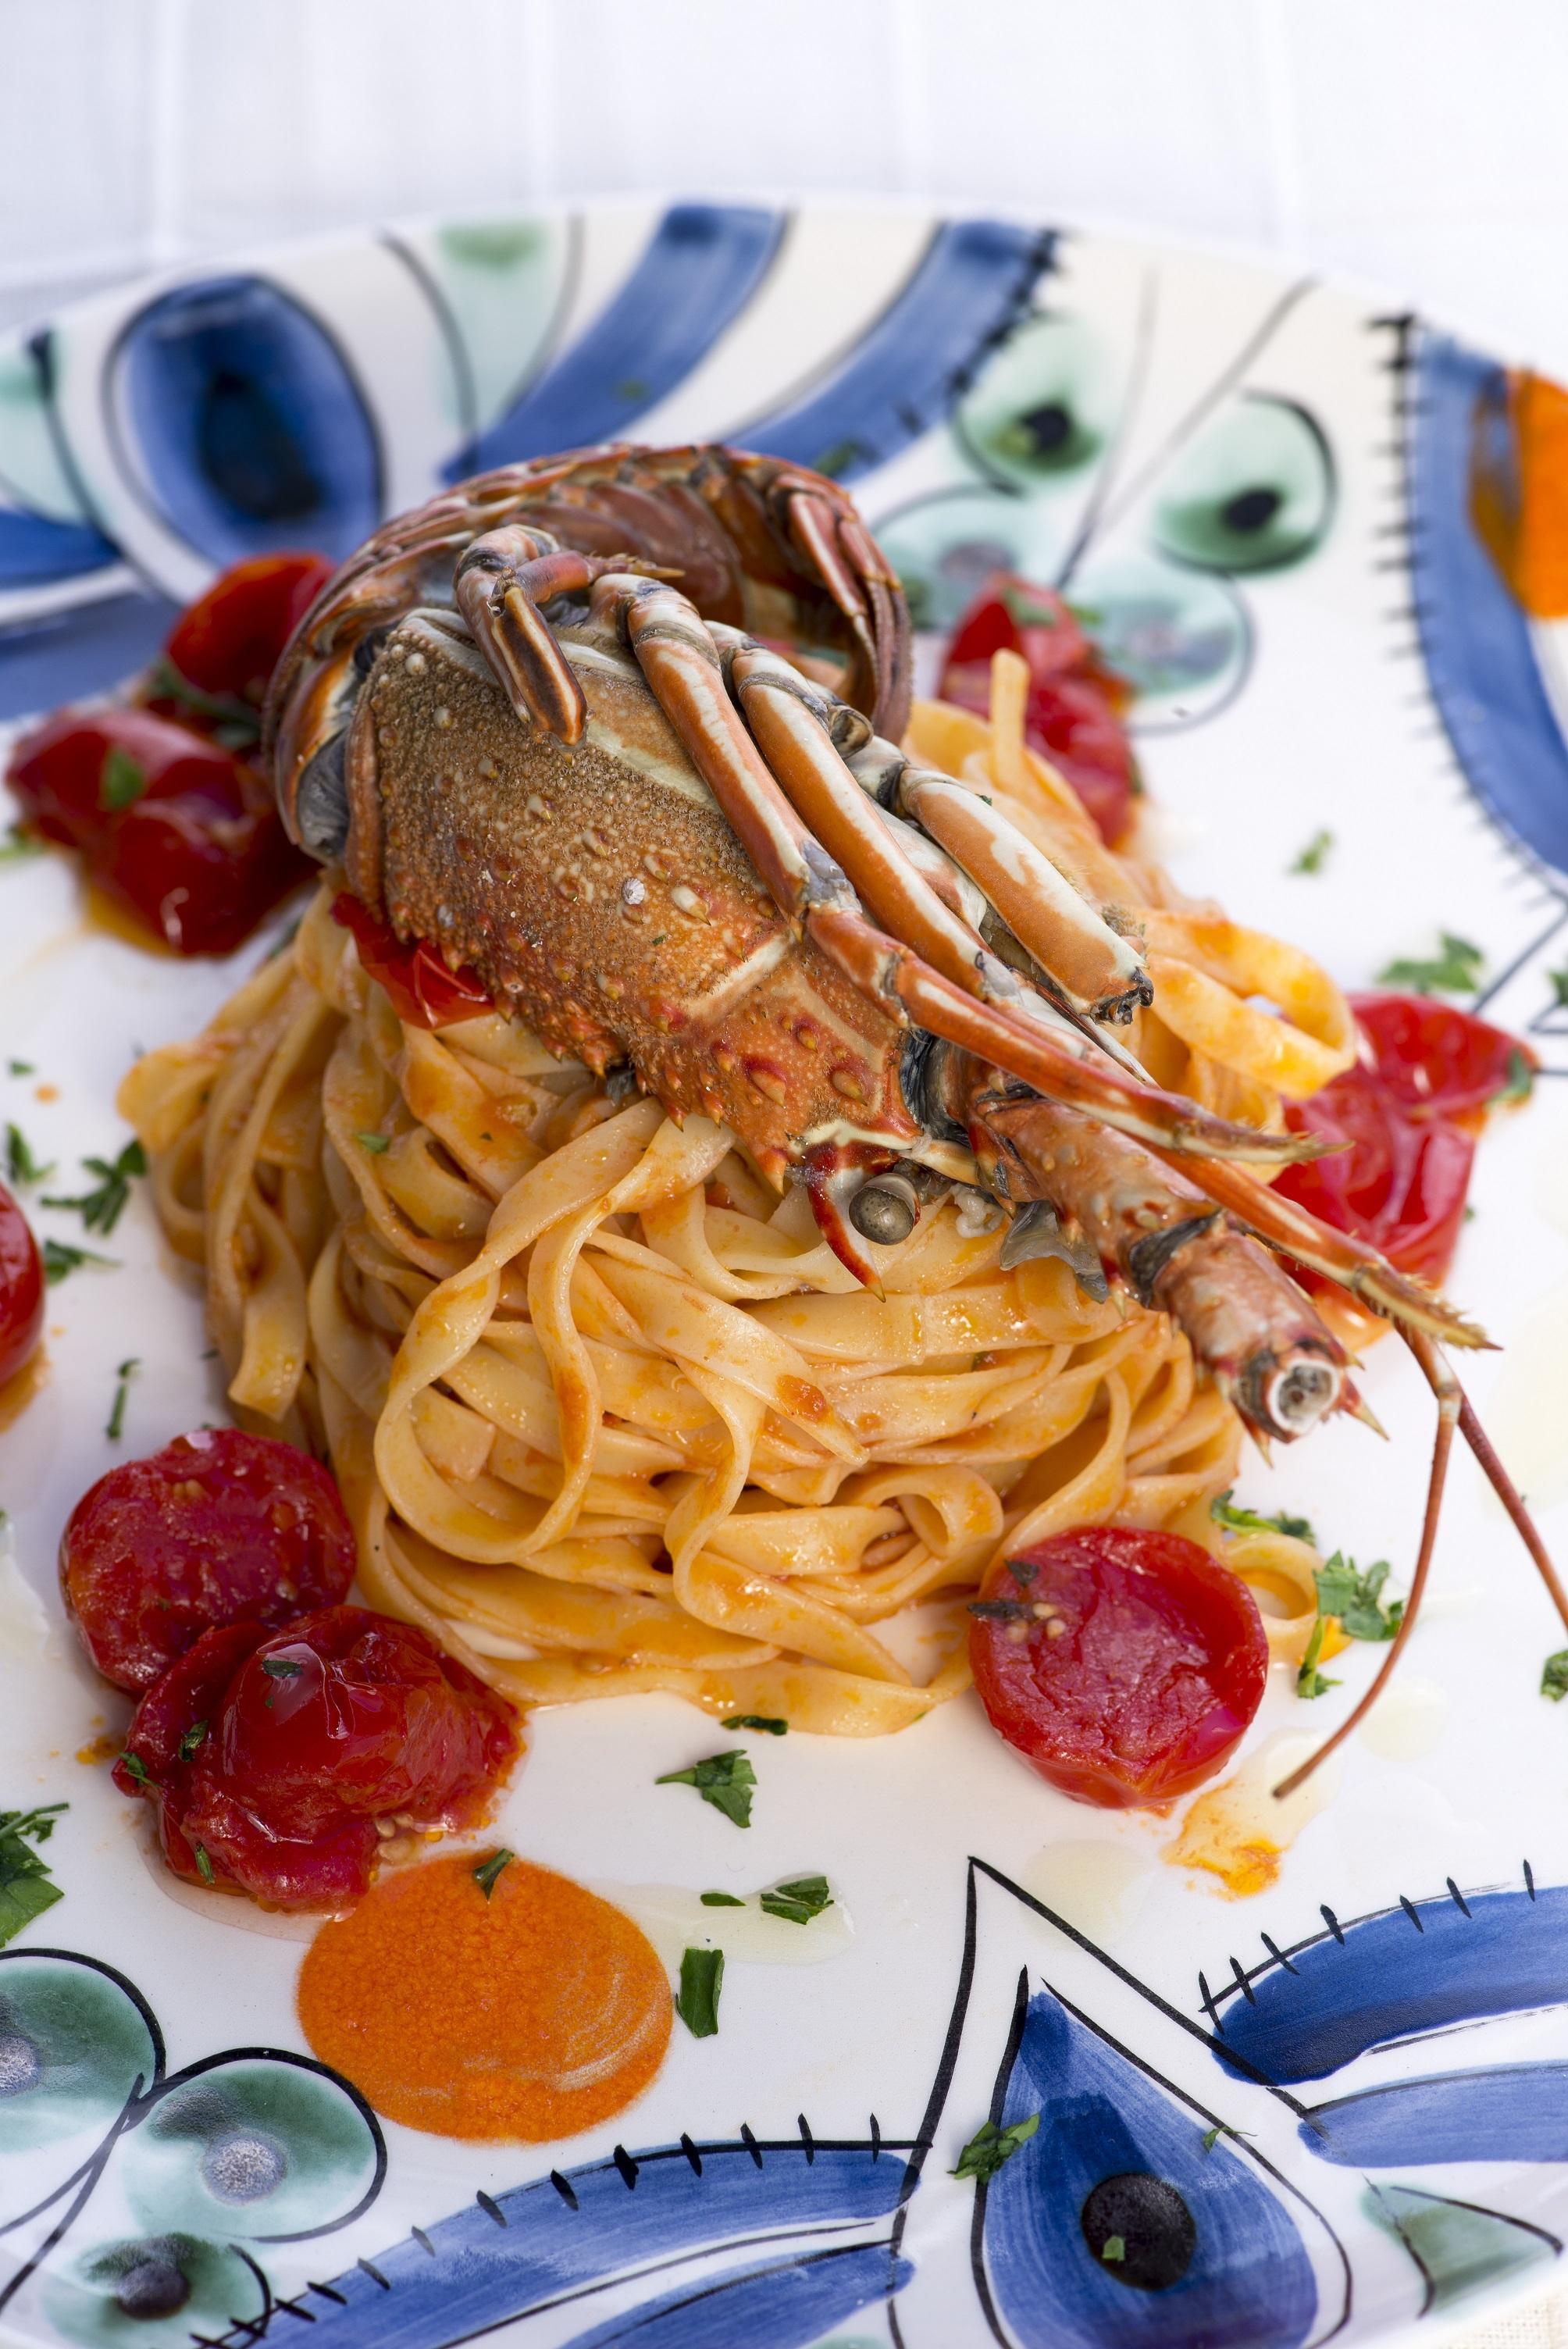 Taste - Out this Sunday - Daphne Caruana Galizia's ...